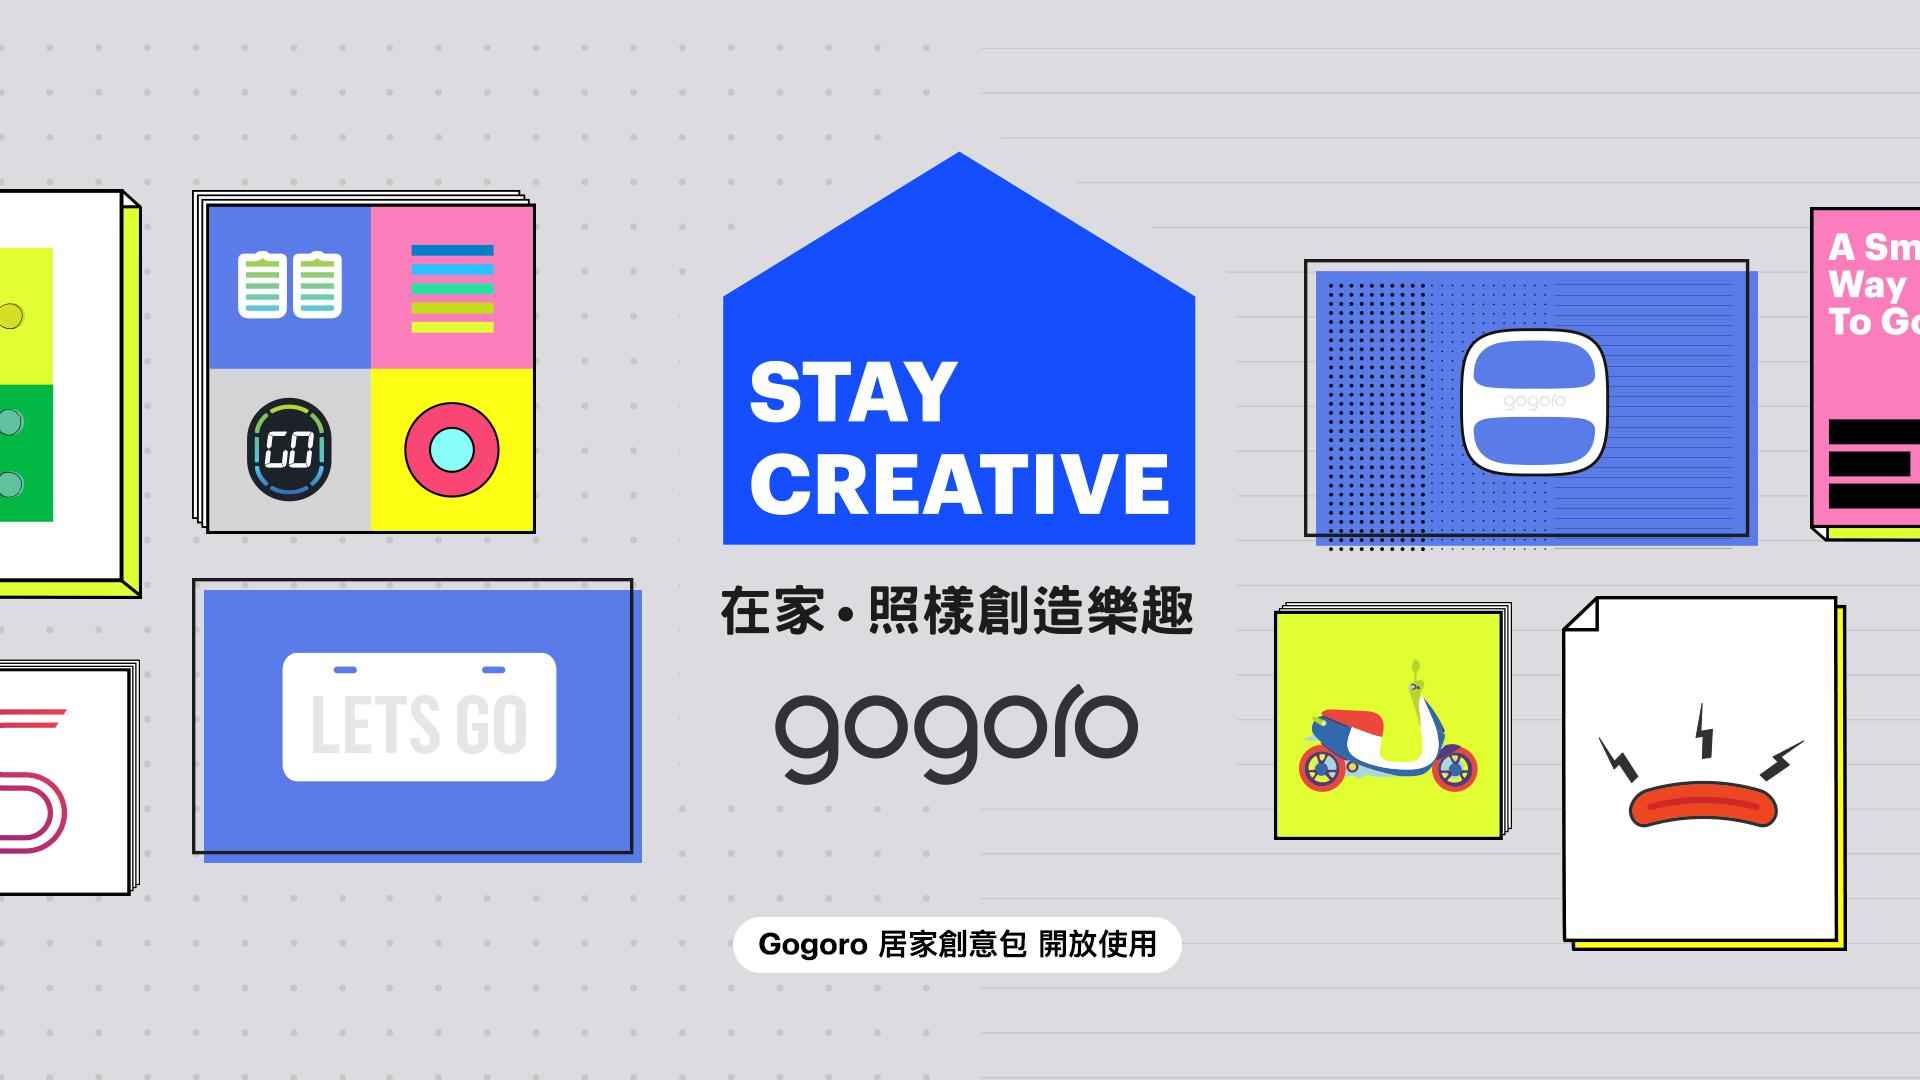 Gogoro 陪你在家抗疫 居家創意工具包免費開放下載